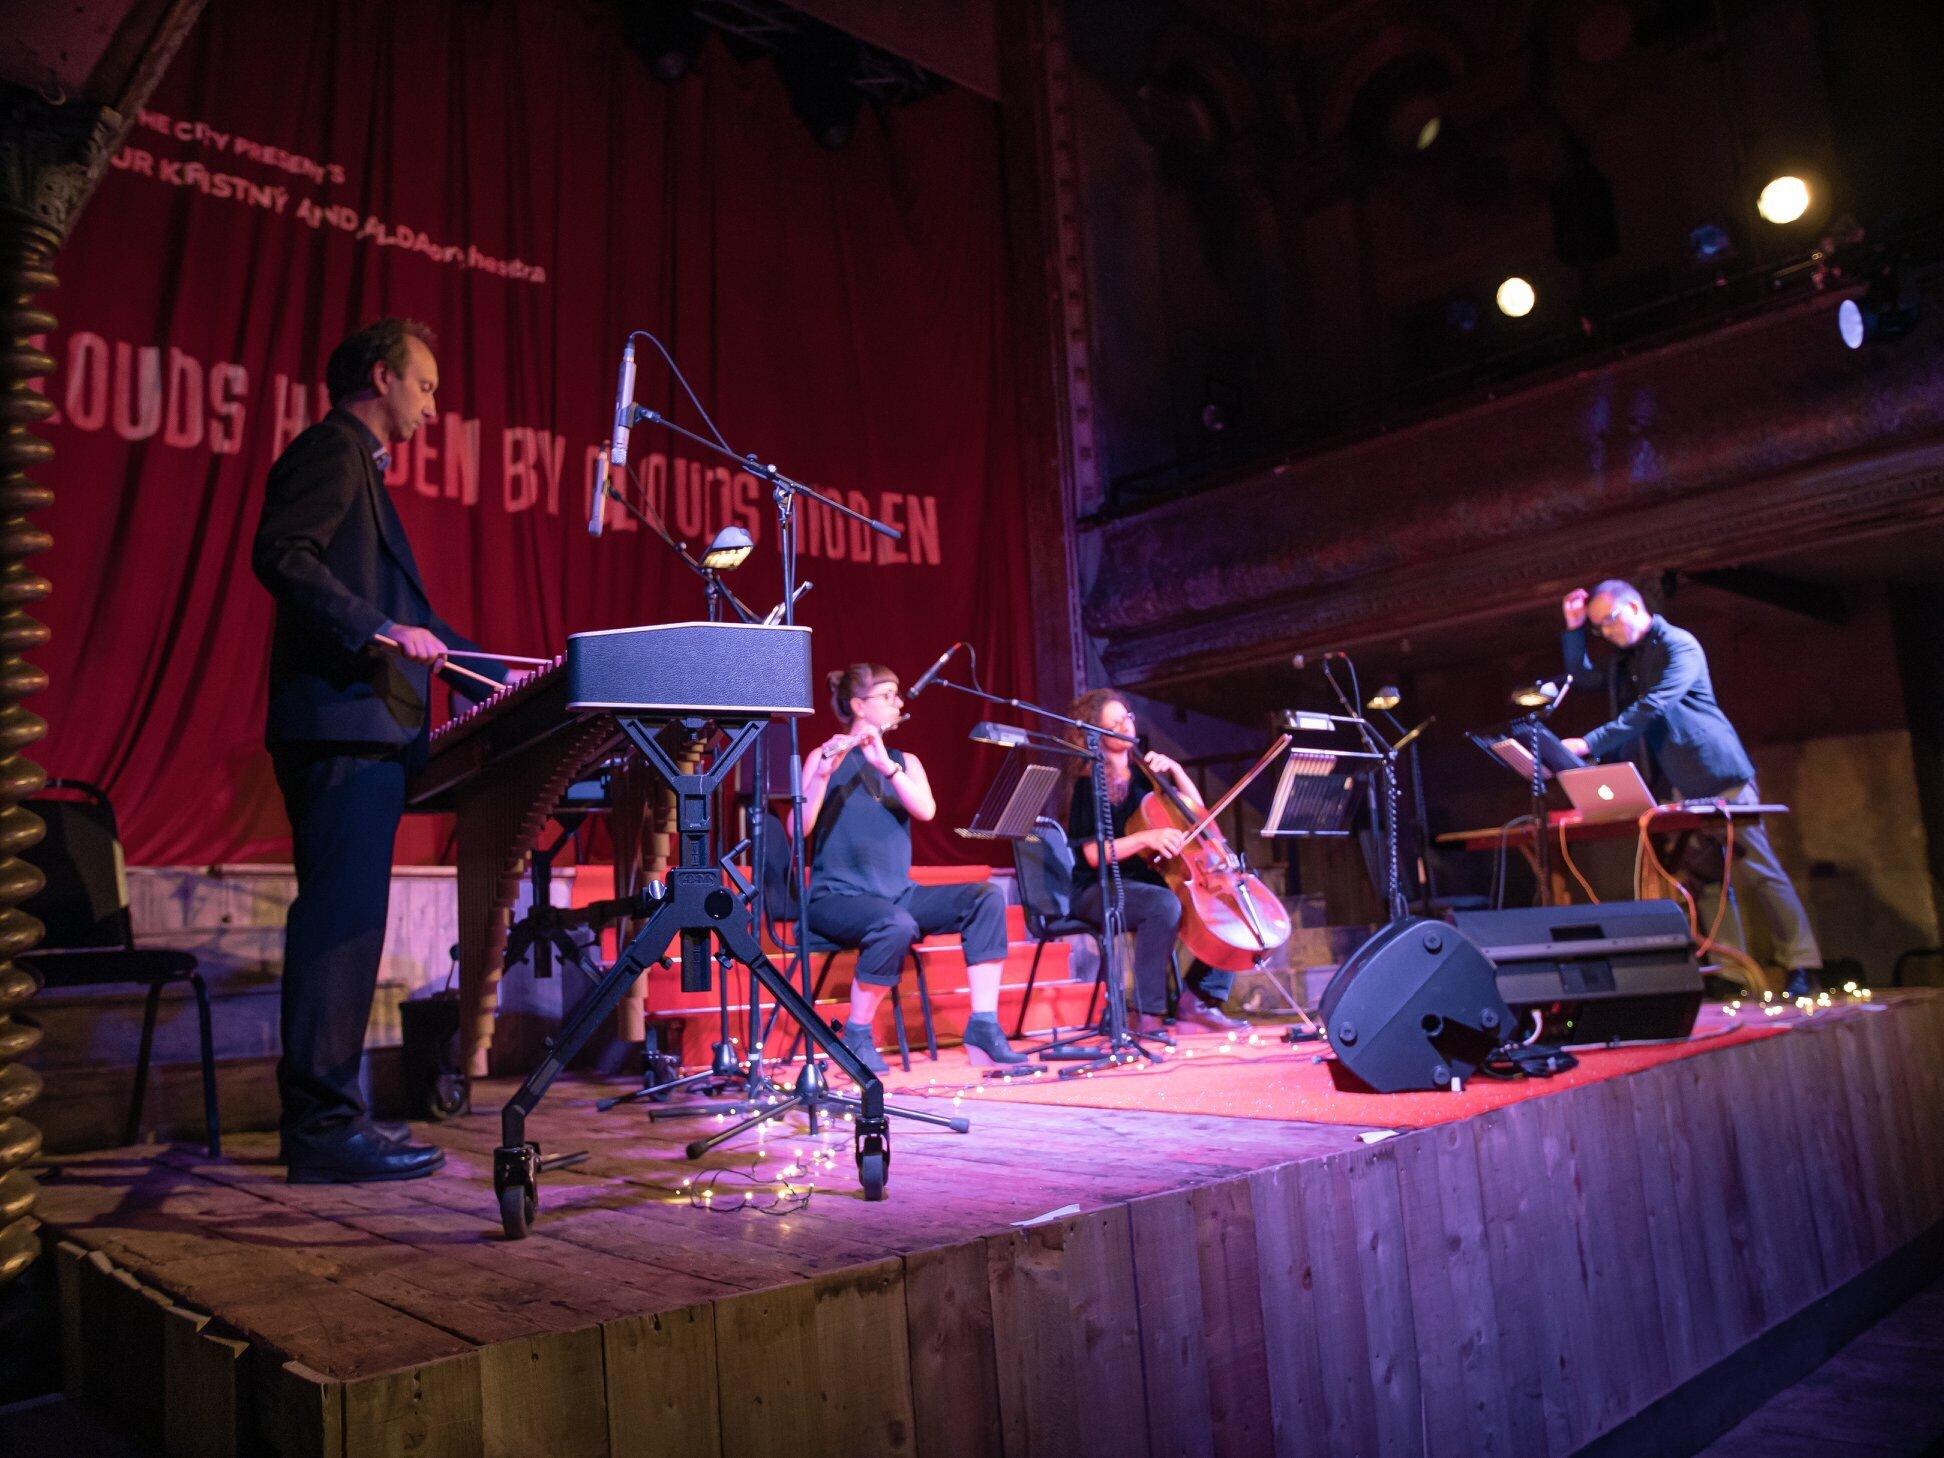 Marimba: Adam Bushell, flute: Helen Whitaker, cello: Sarah Davison, electronics: Helgi R Ingvarsson.